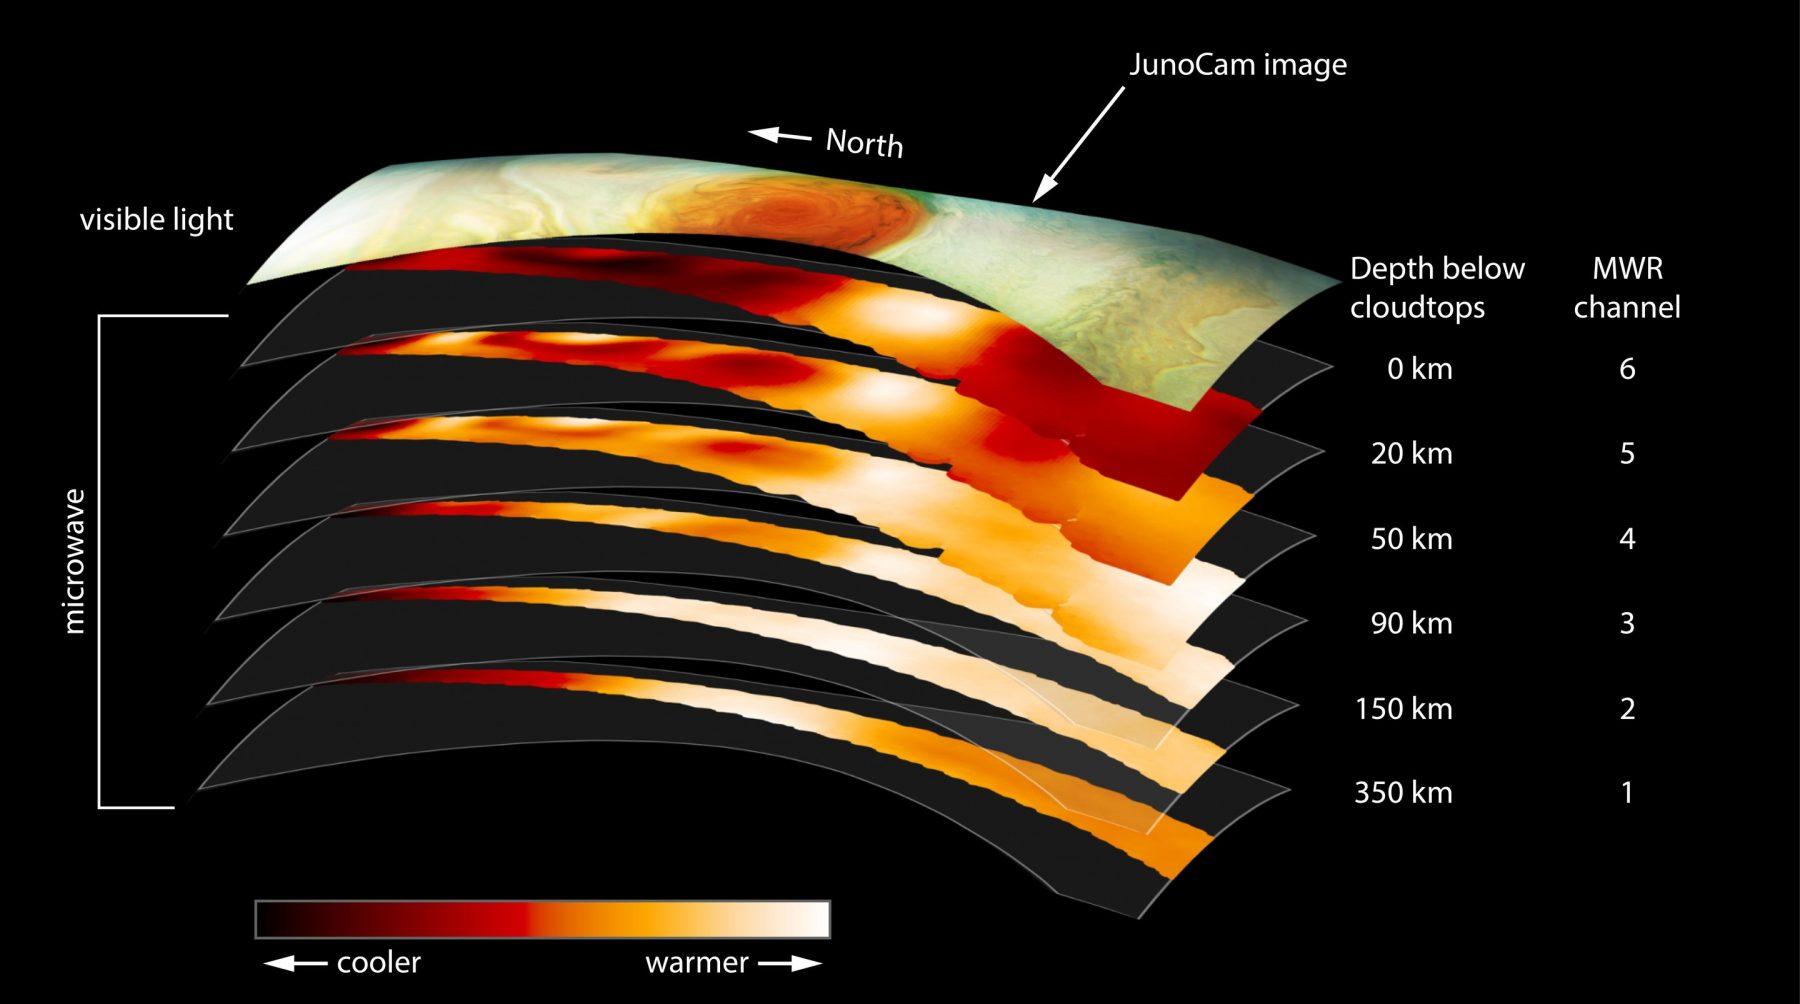 Temperature of different cloud layers. Credit: NASA / JPL-Caltech / SwRI / JHUAPL